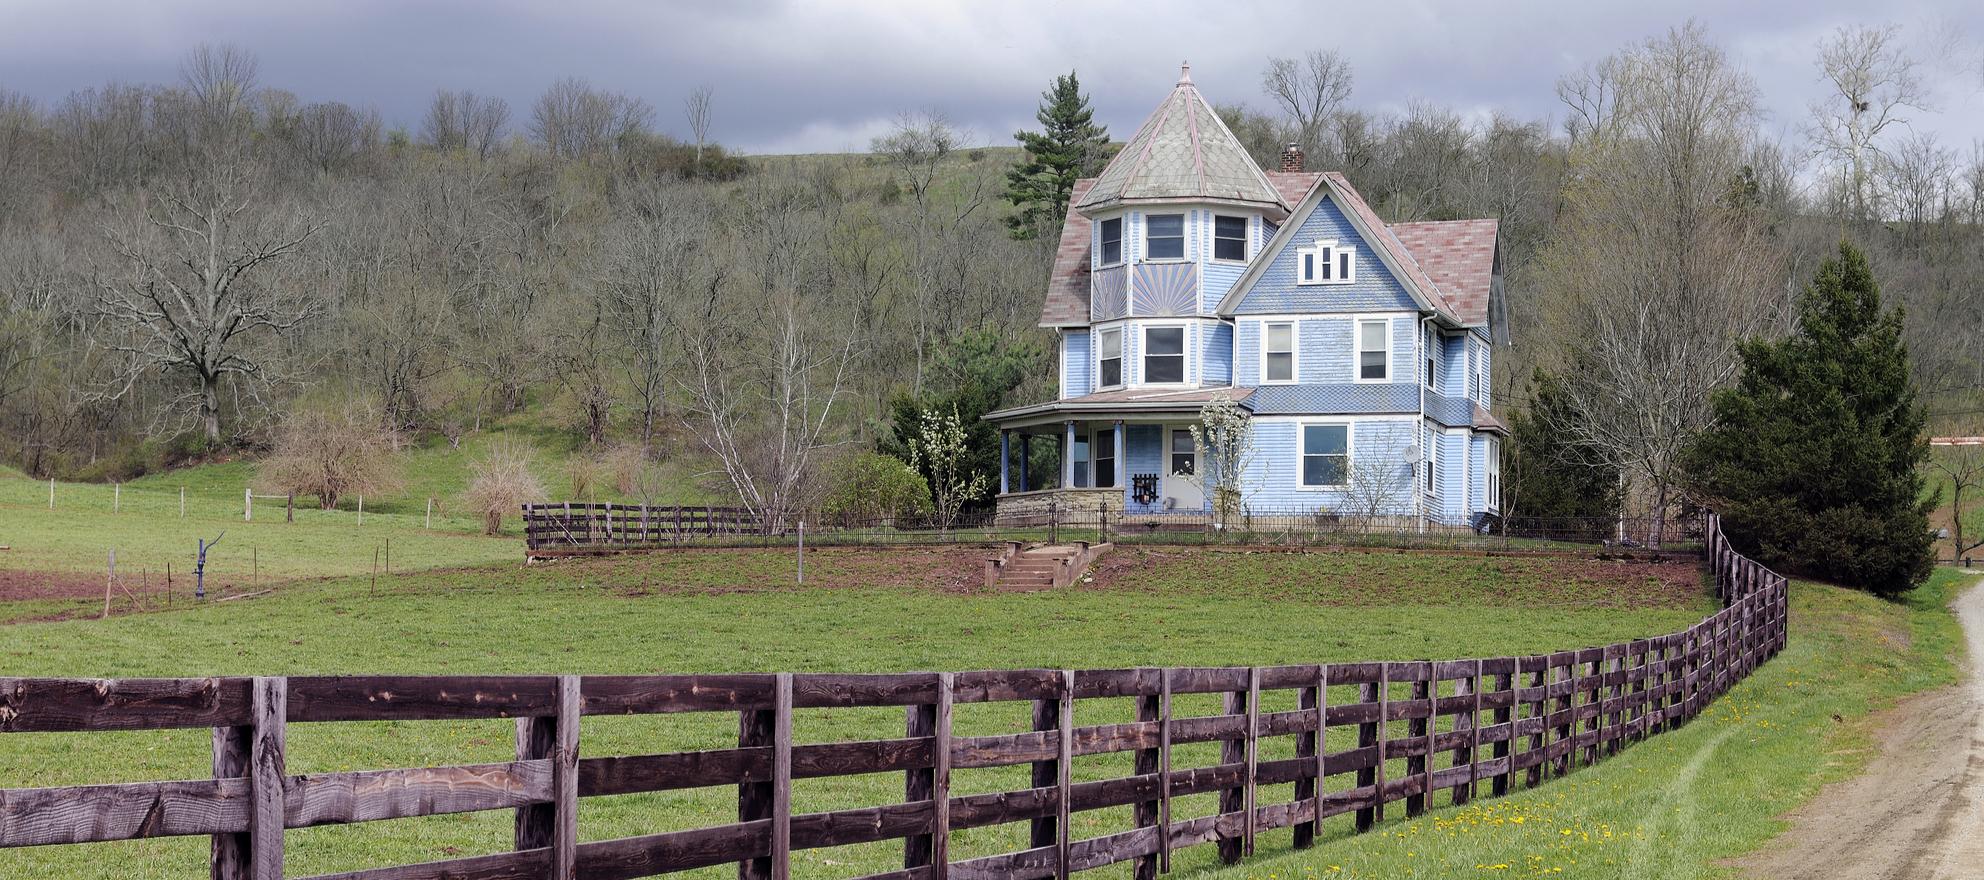 Fullsize Of Circa Old Houses